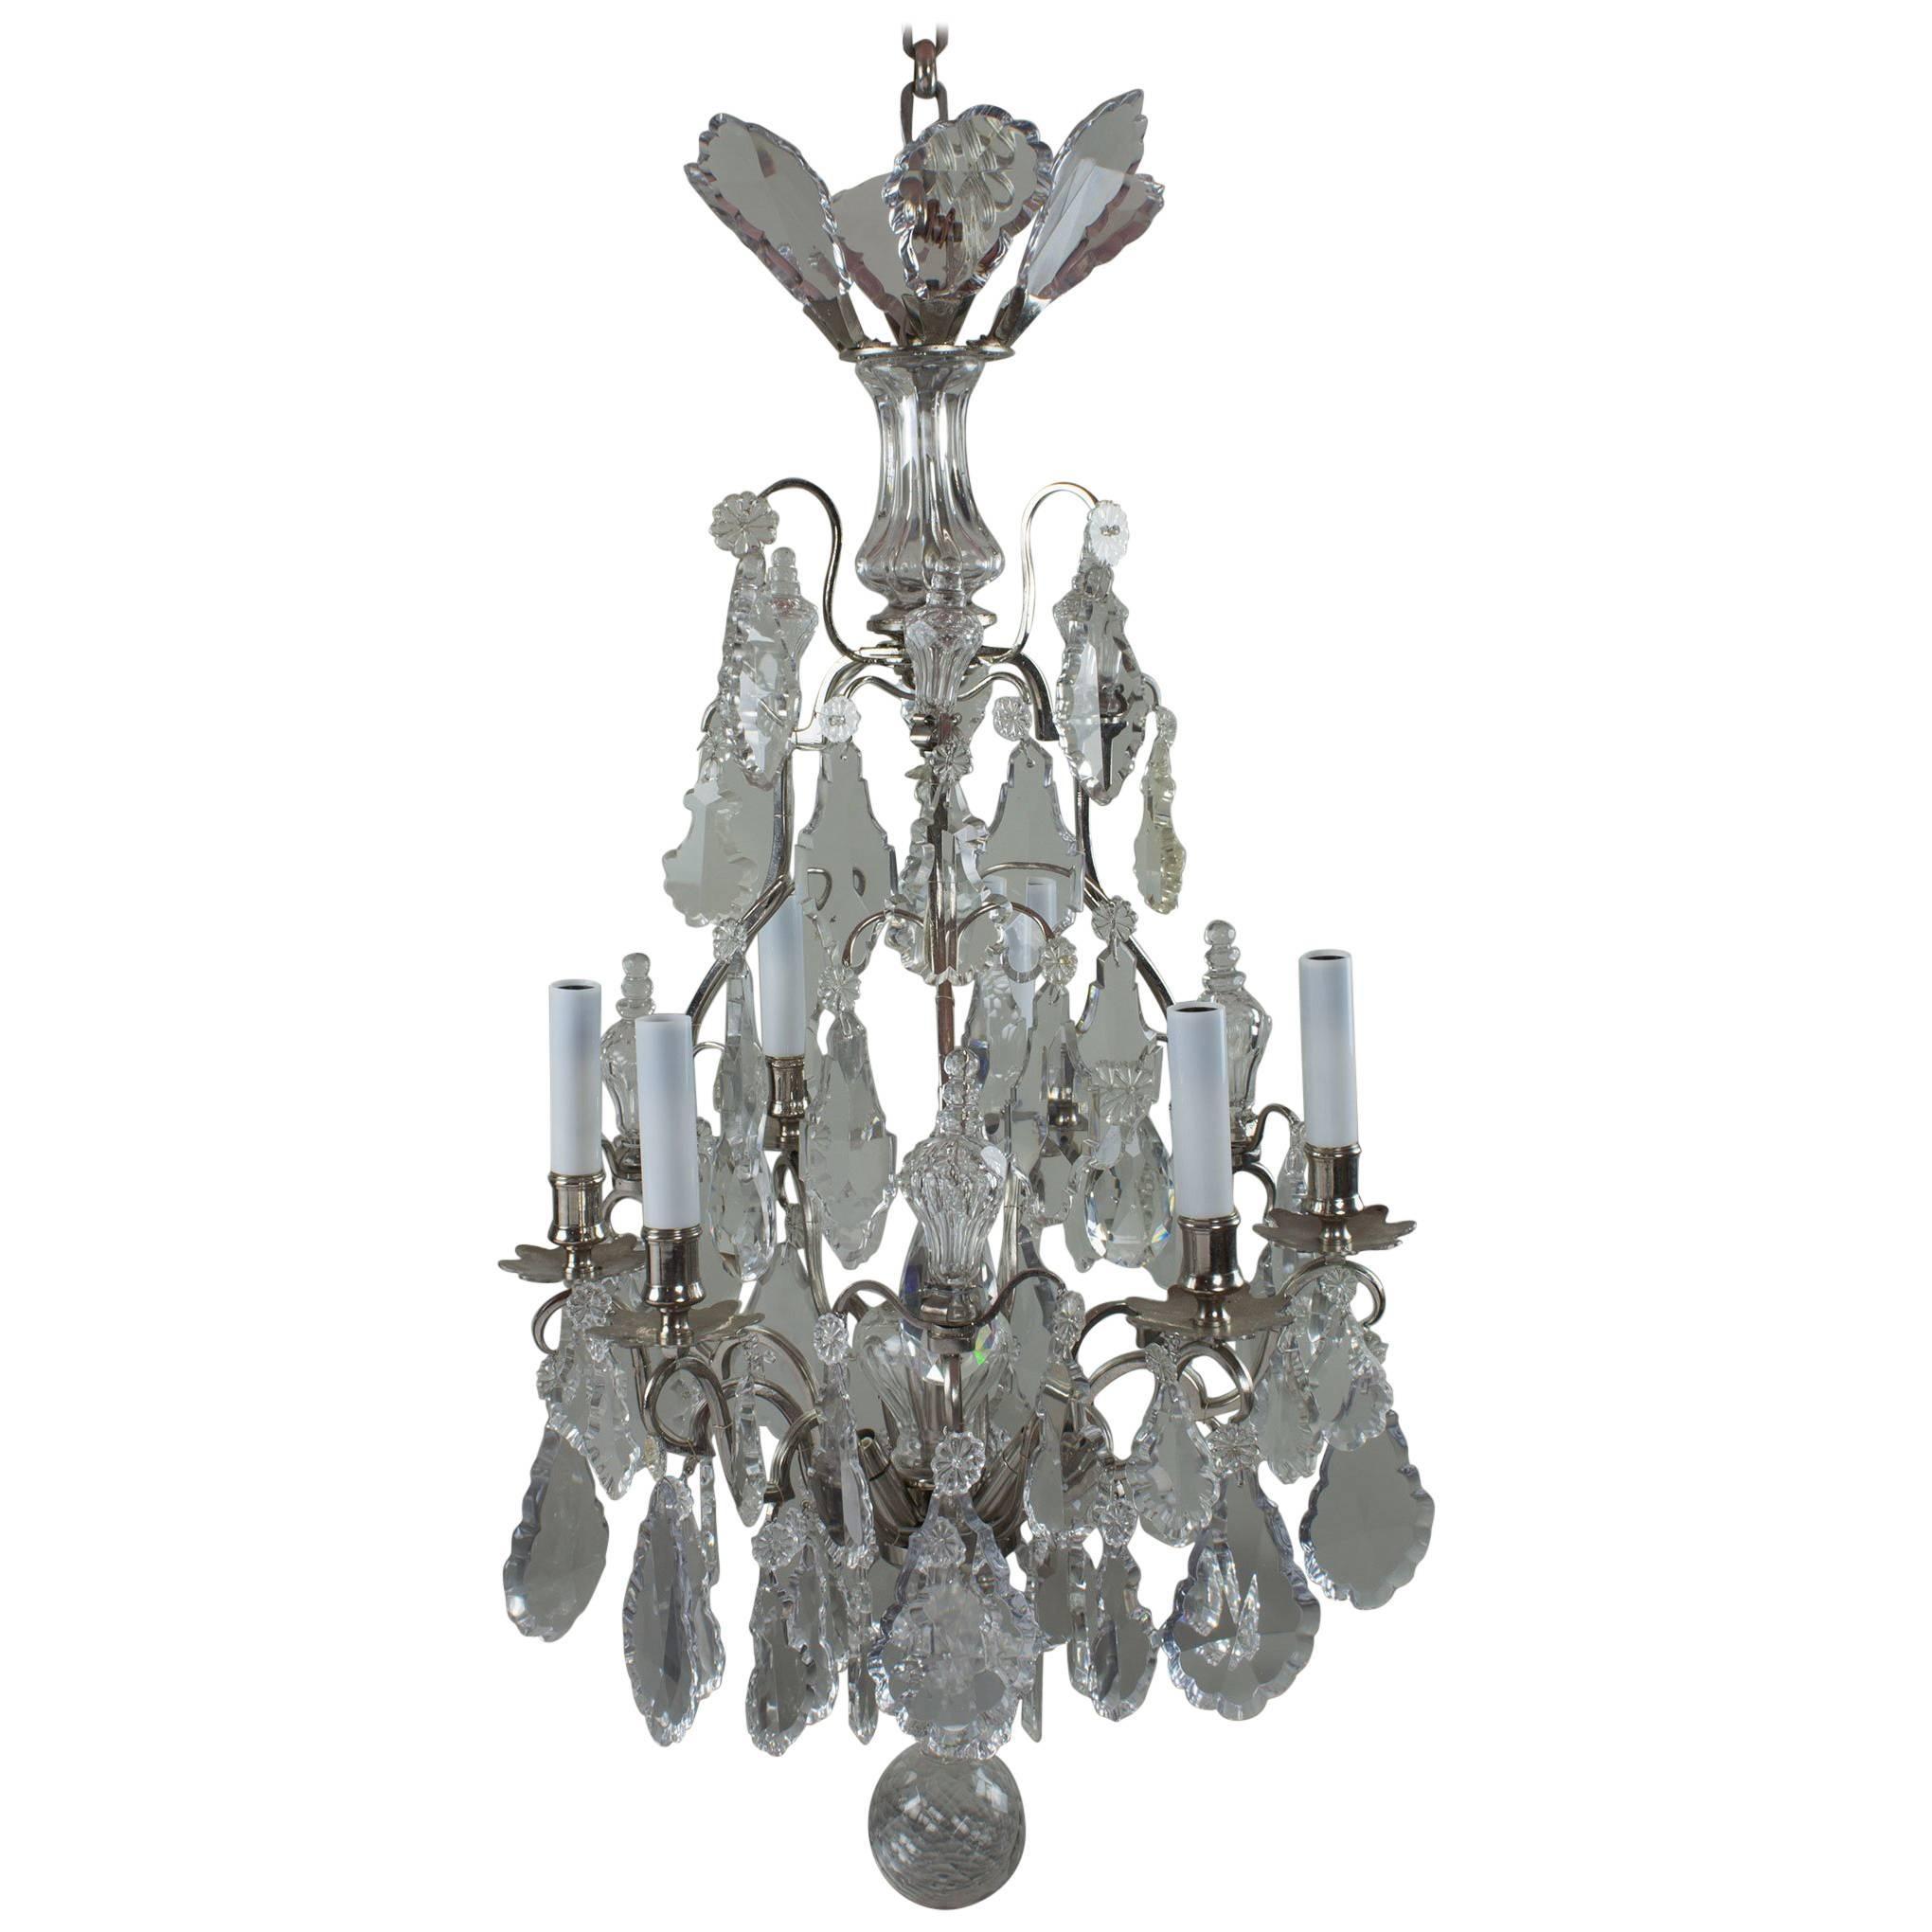 19th Century Nine Light Crystal Chandelier Six Light Arms